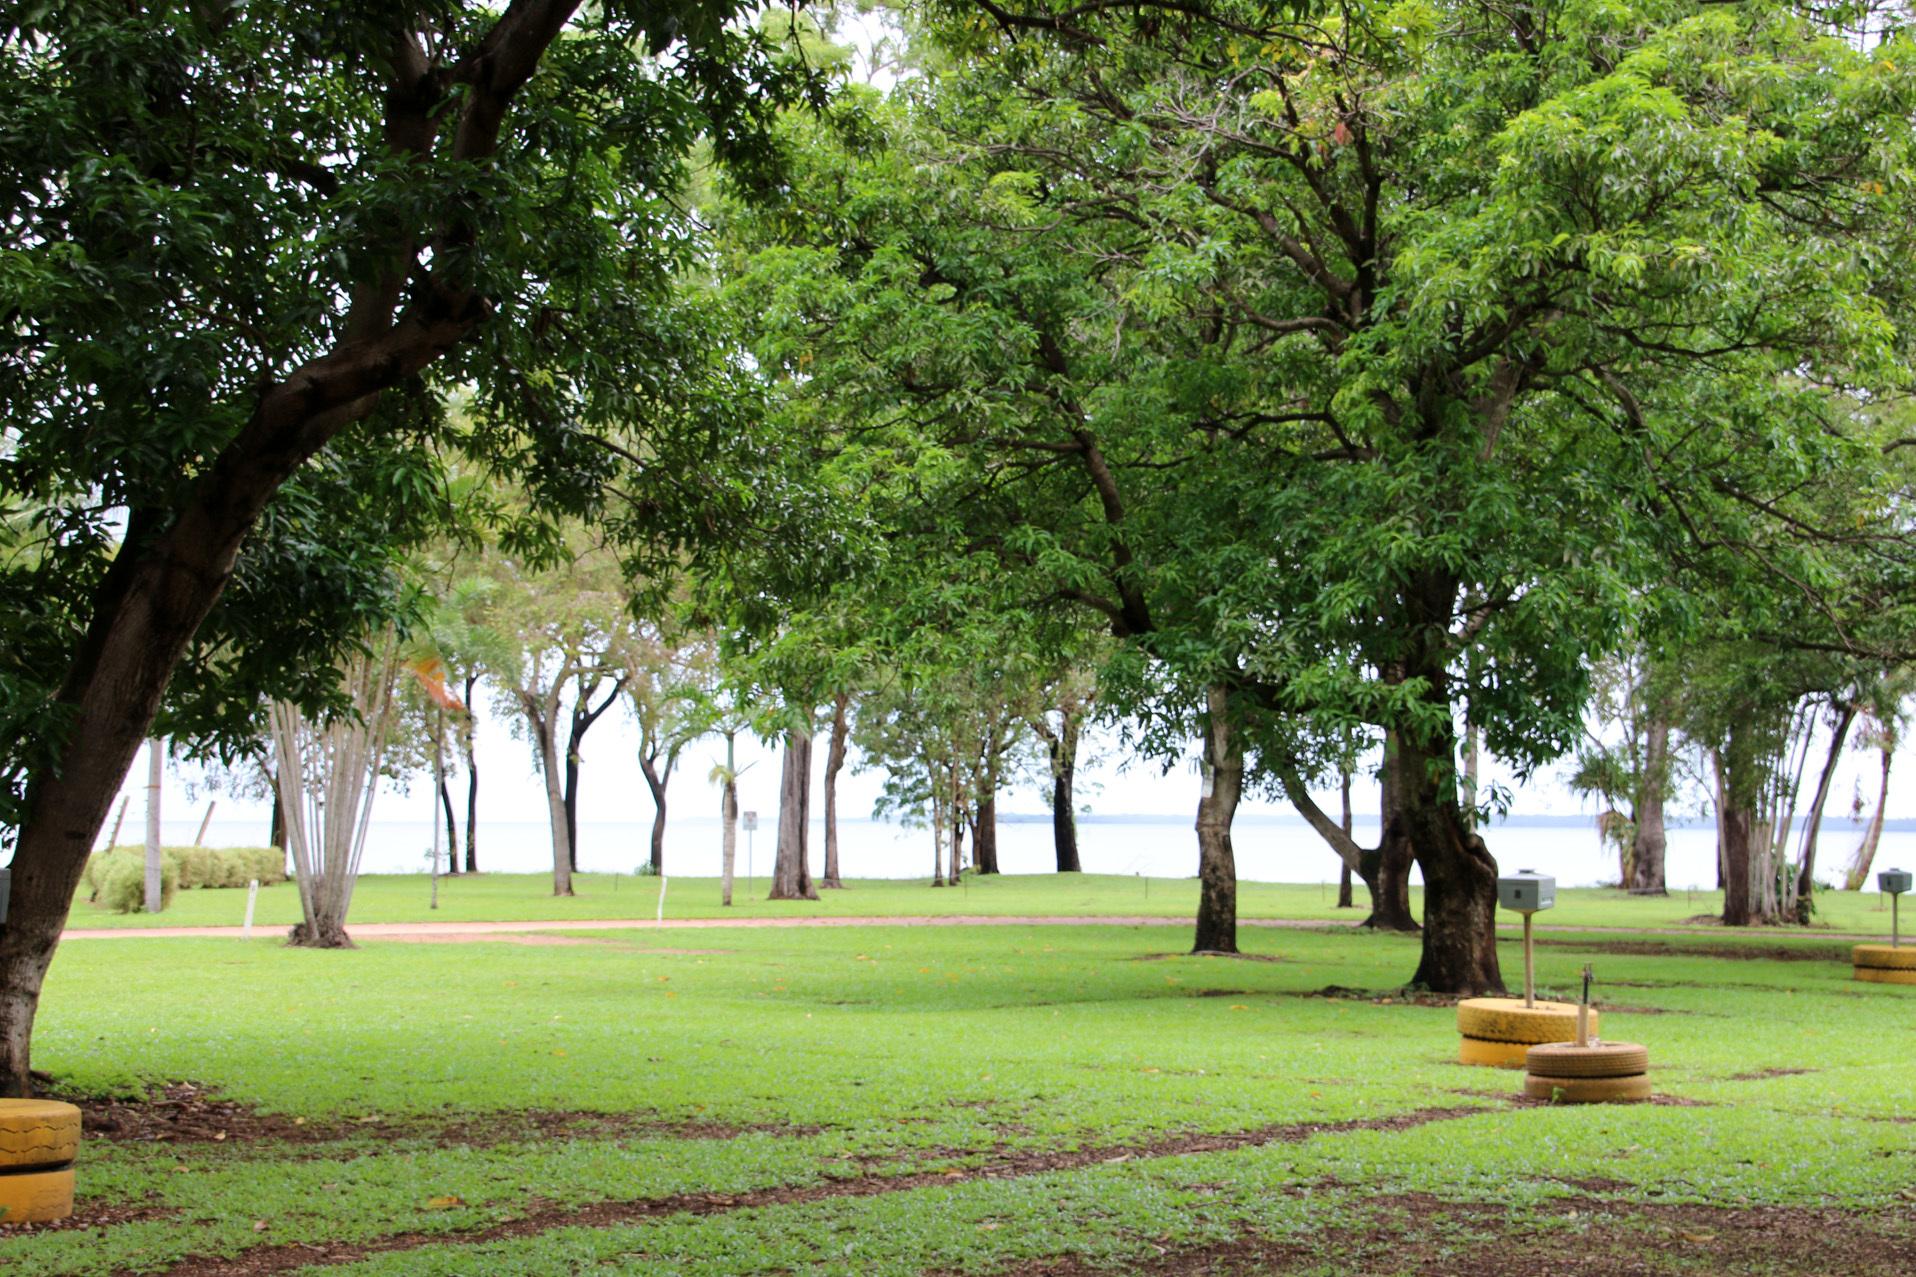 b - Weipa Caravan Park & Camping Ground